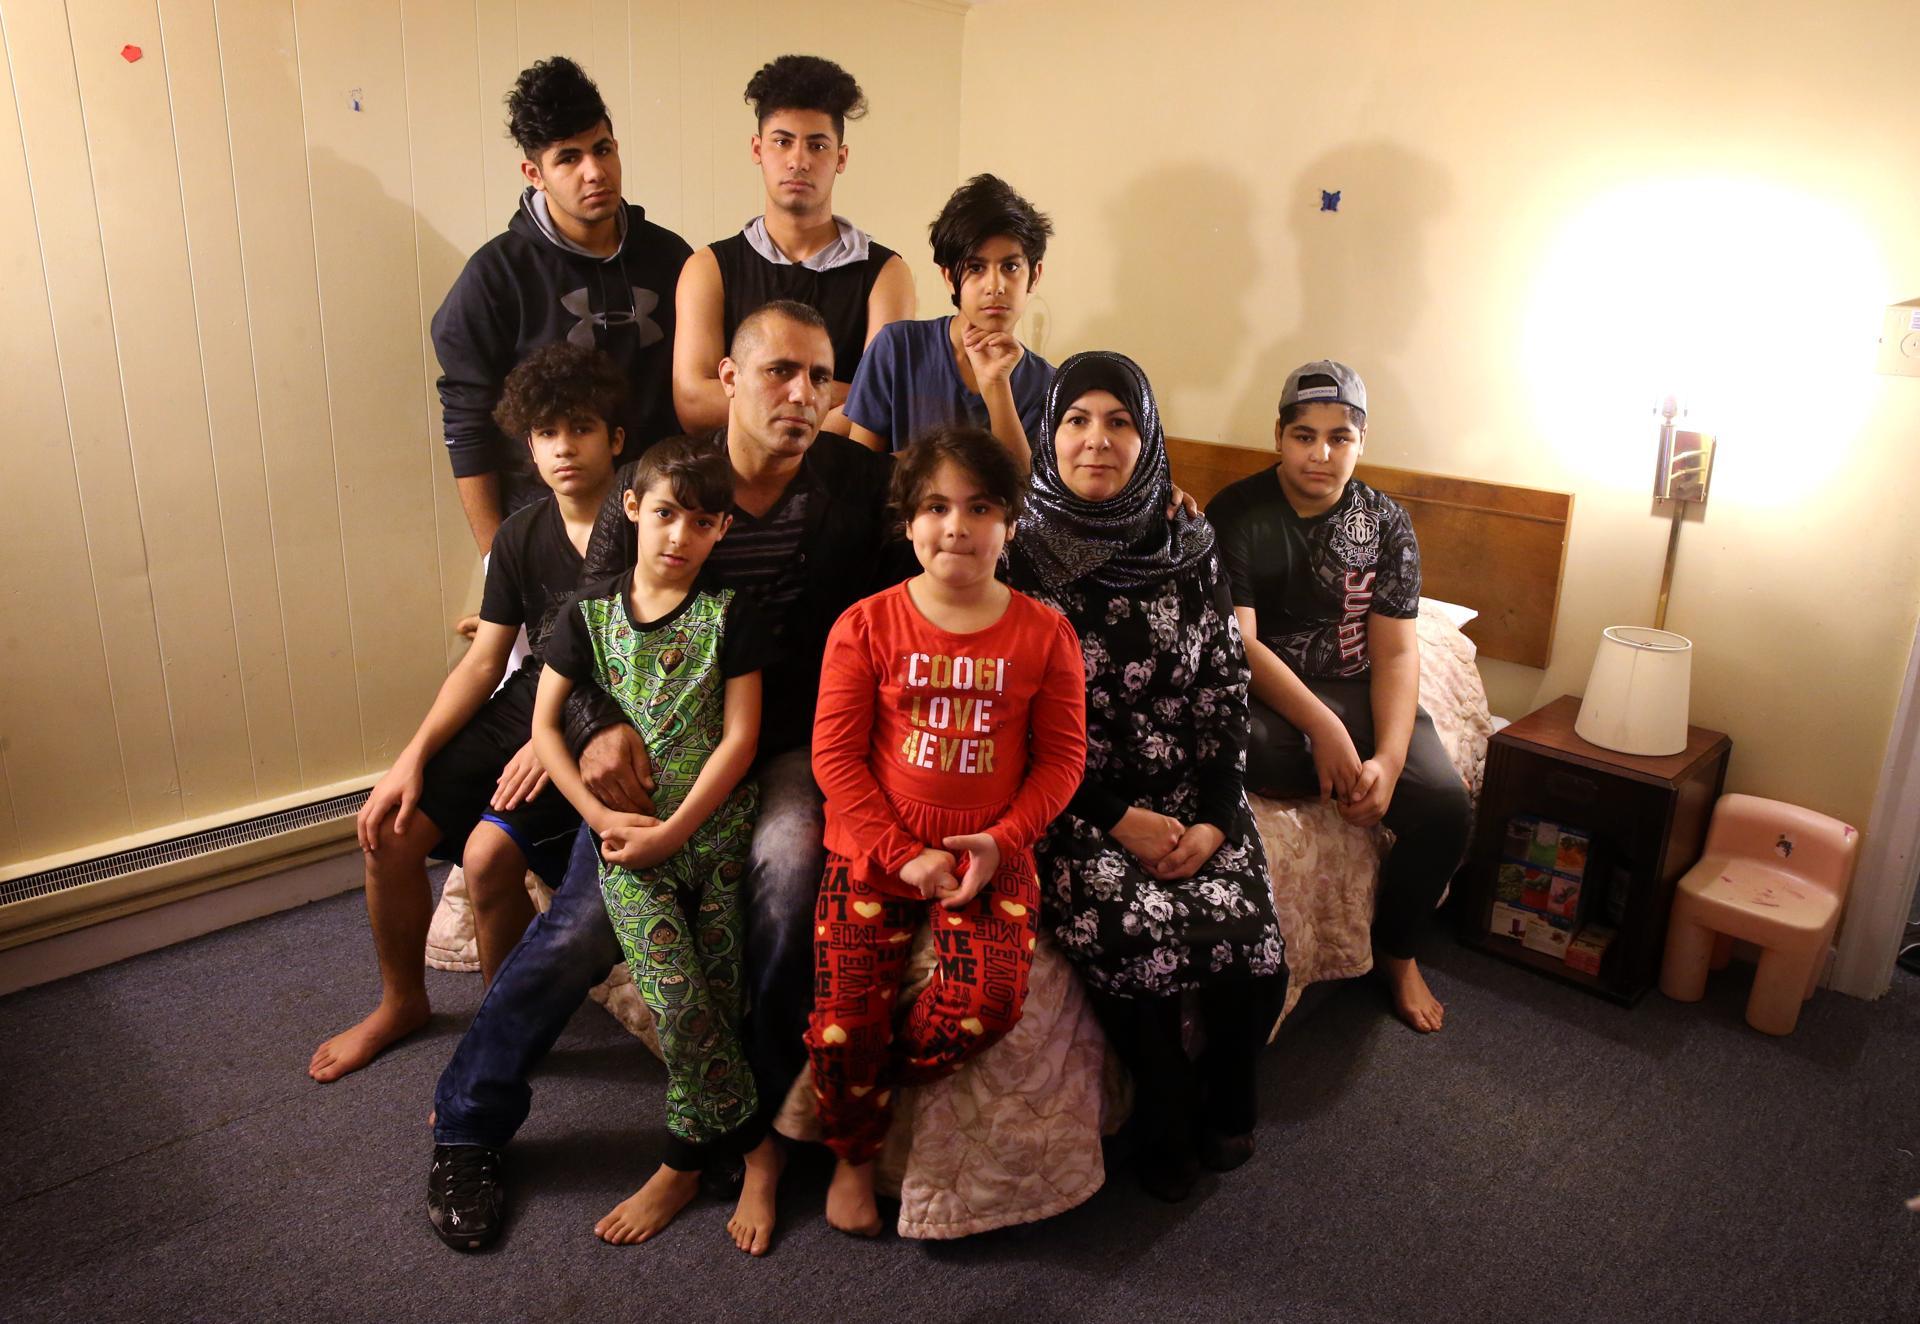 The Al Rubaye Family